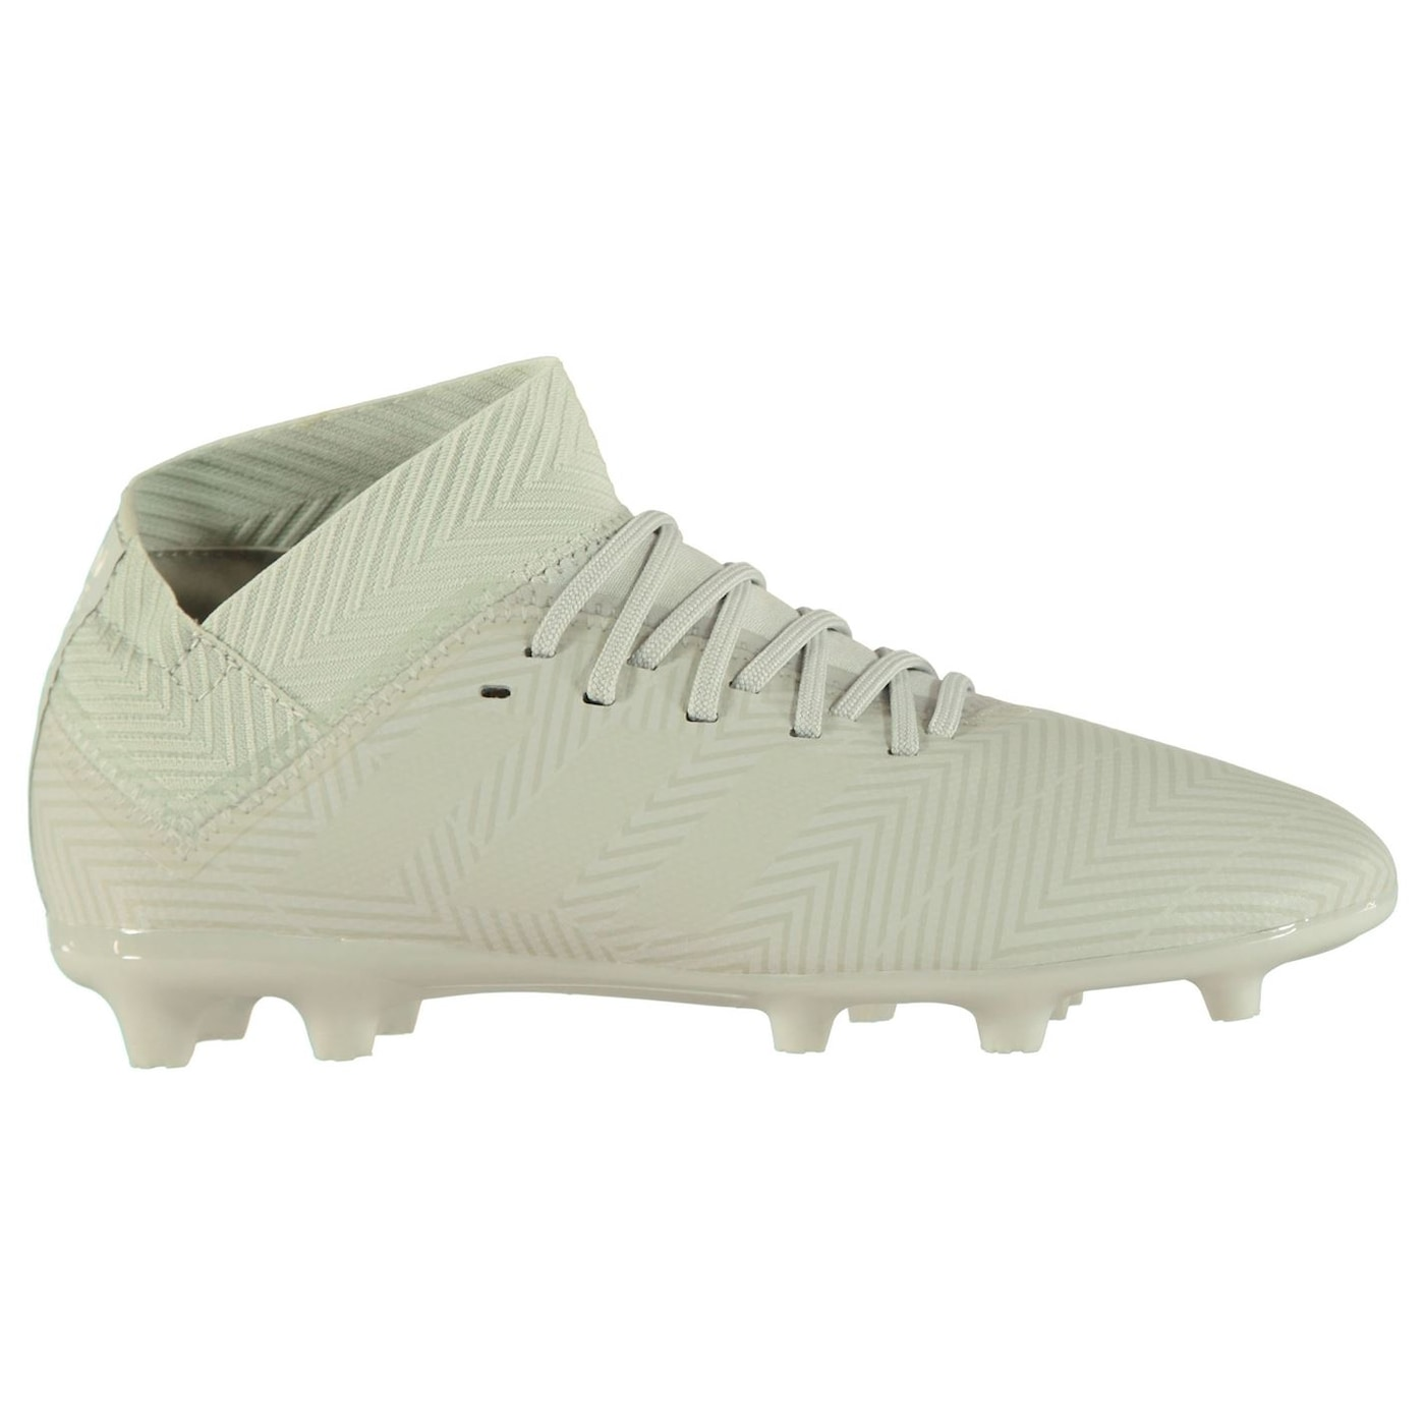 kopačky adidas Nemeziz 18.3 Childrens FG